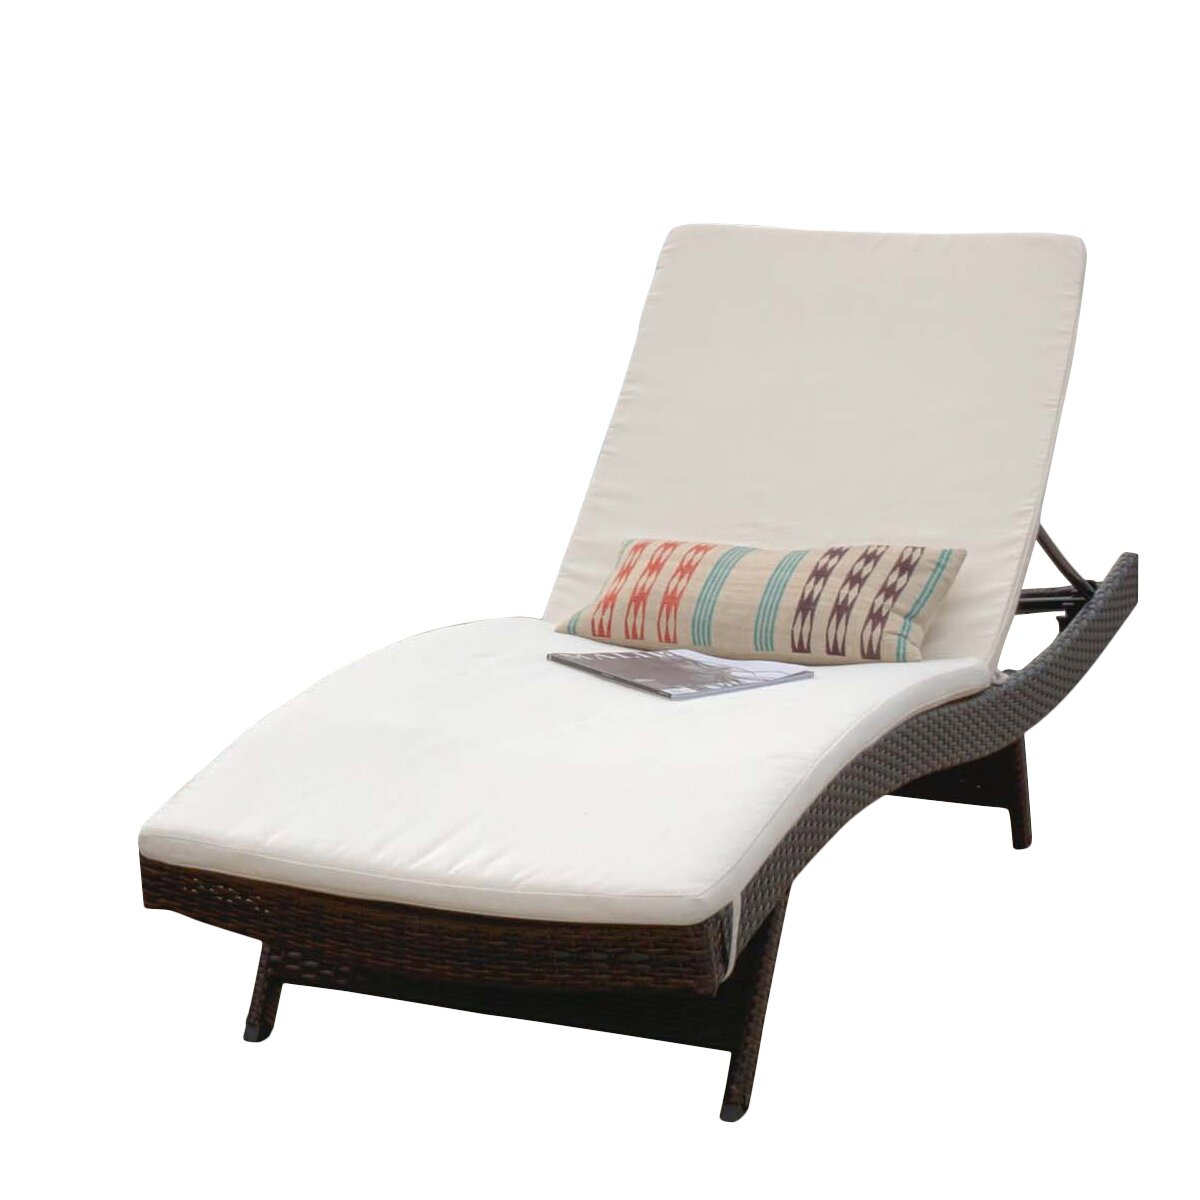 Home loft concepts outdoor sunbrella chaise lounge cushion for Chaise lounge cushion outdoor